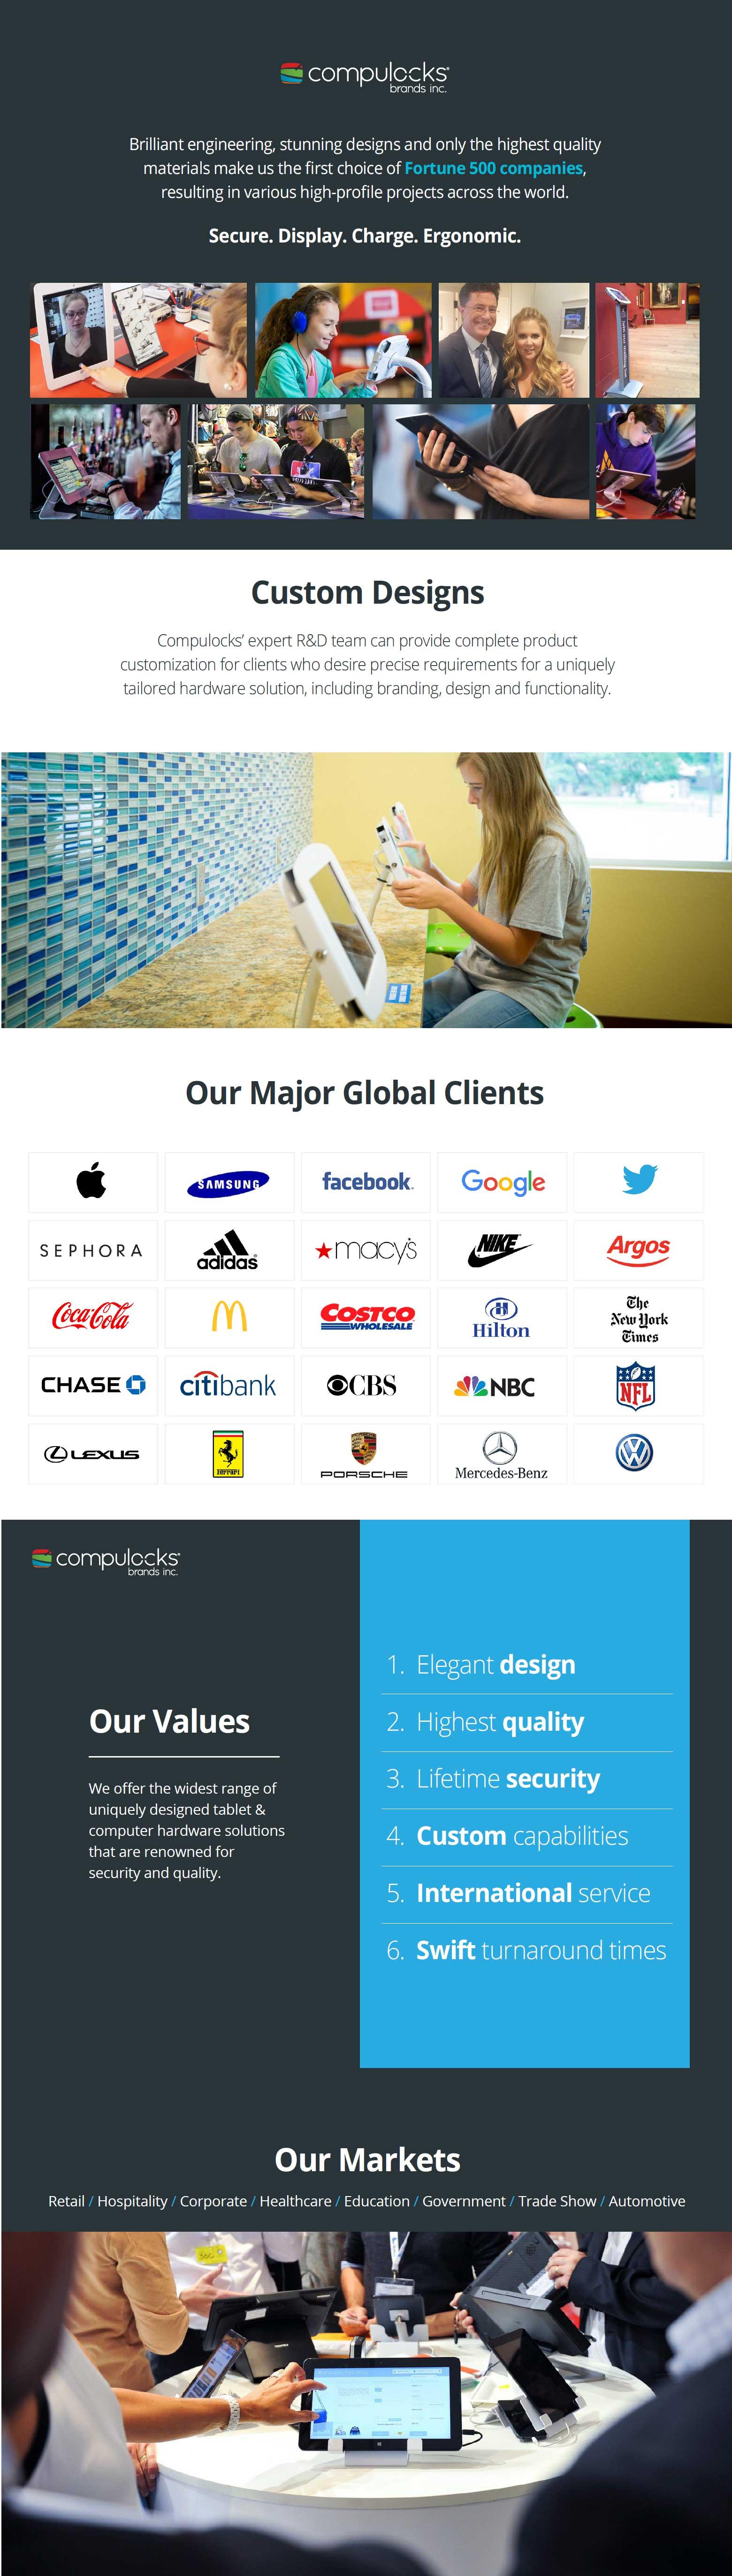 Compulocks Brands Inc